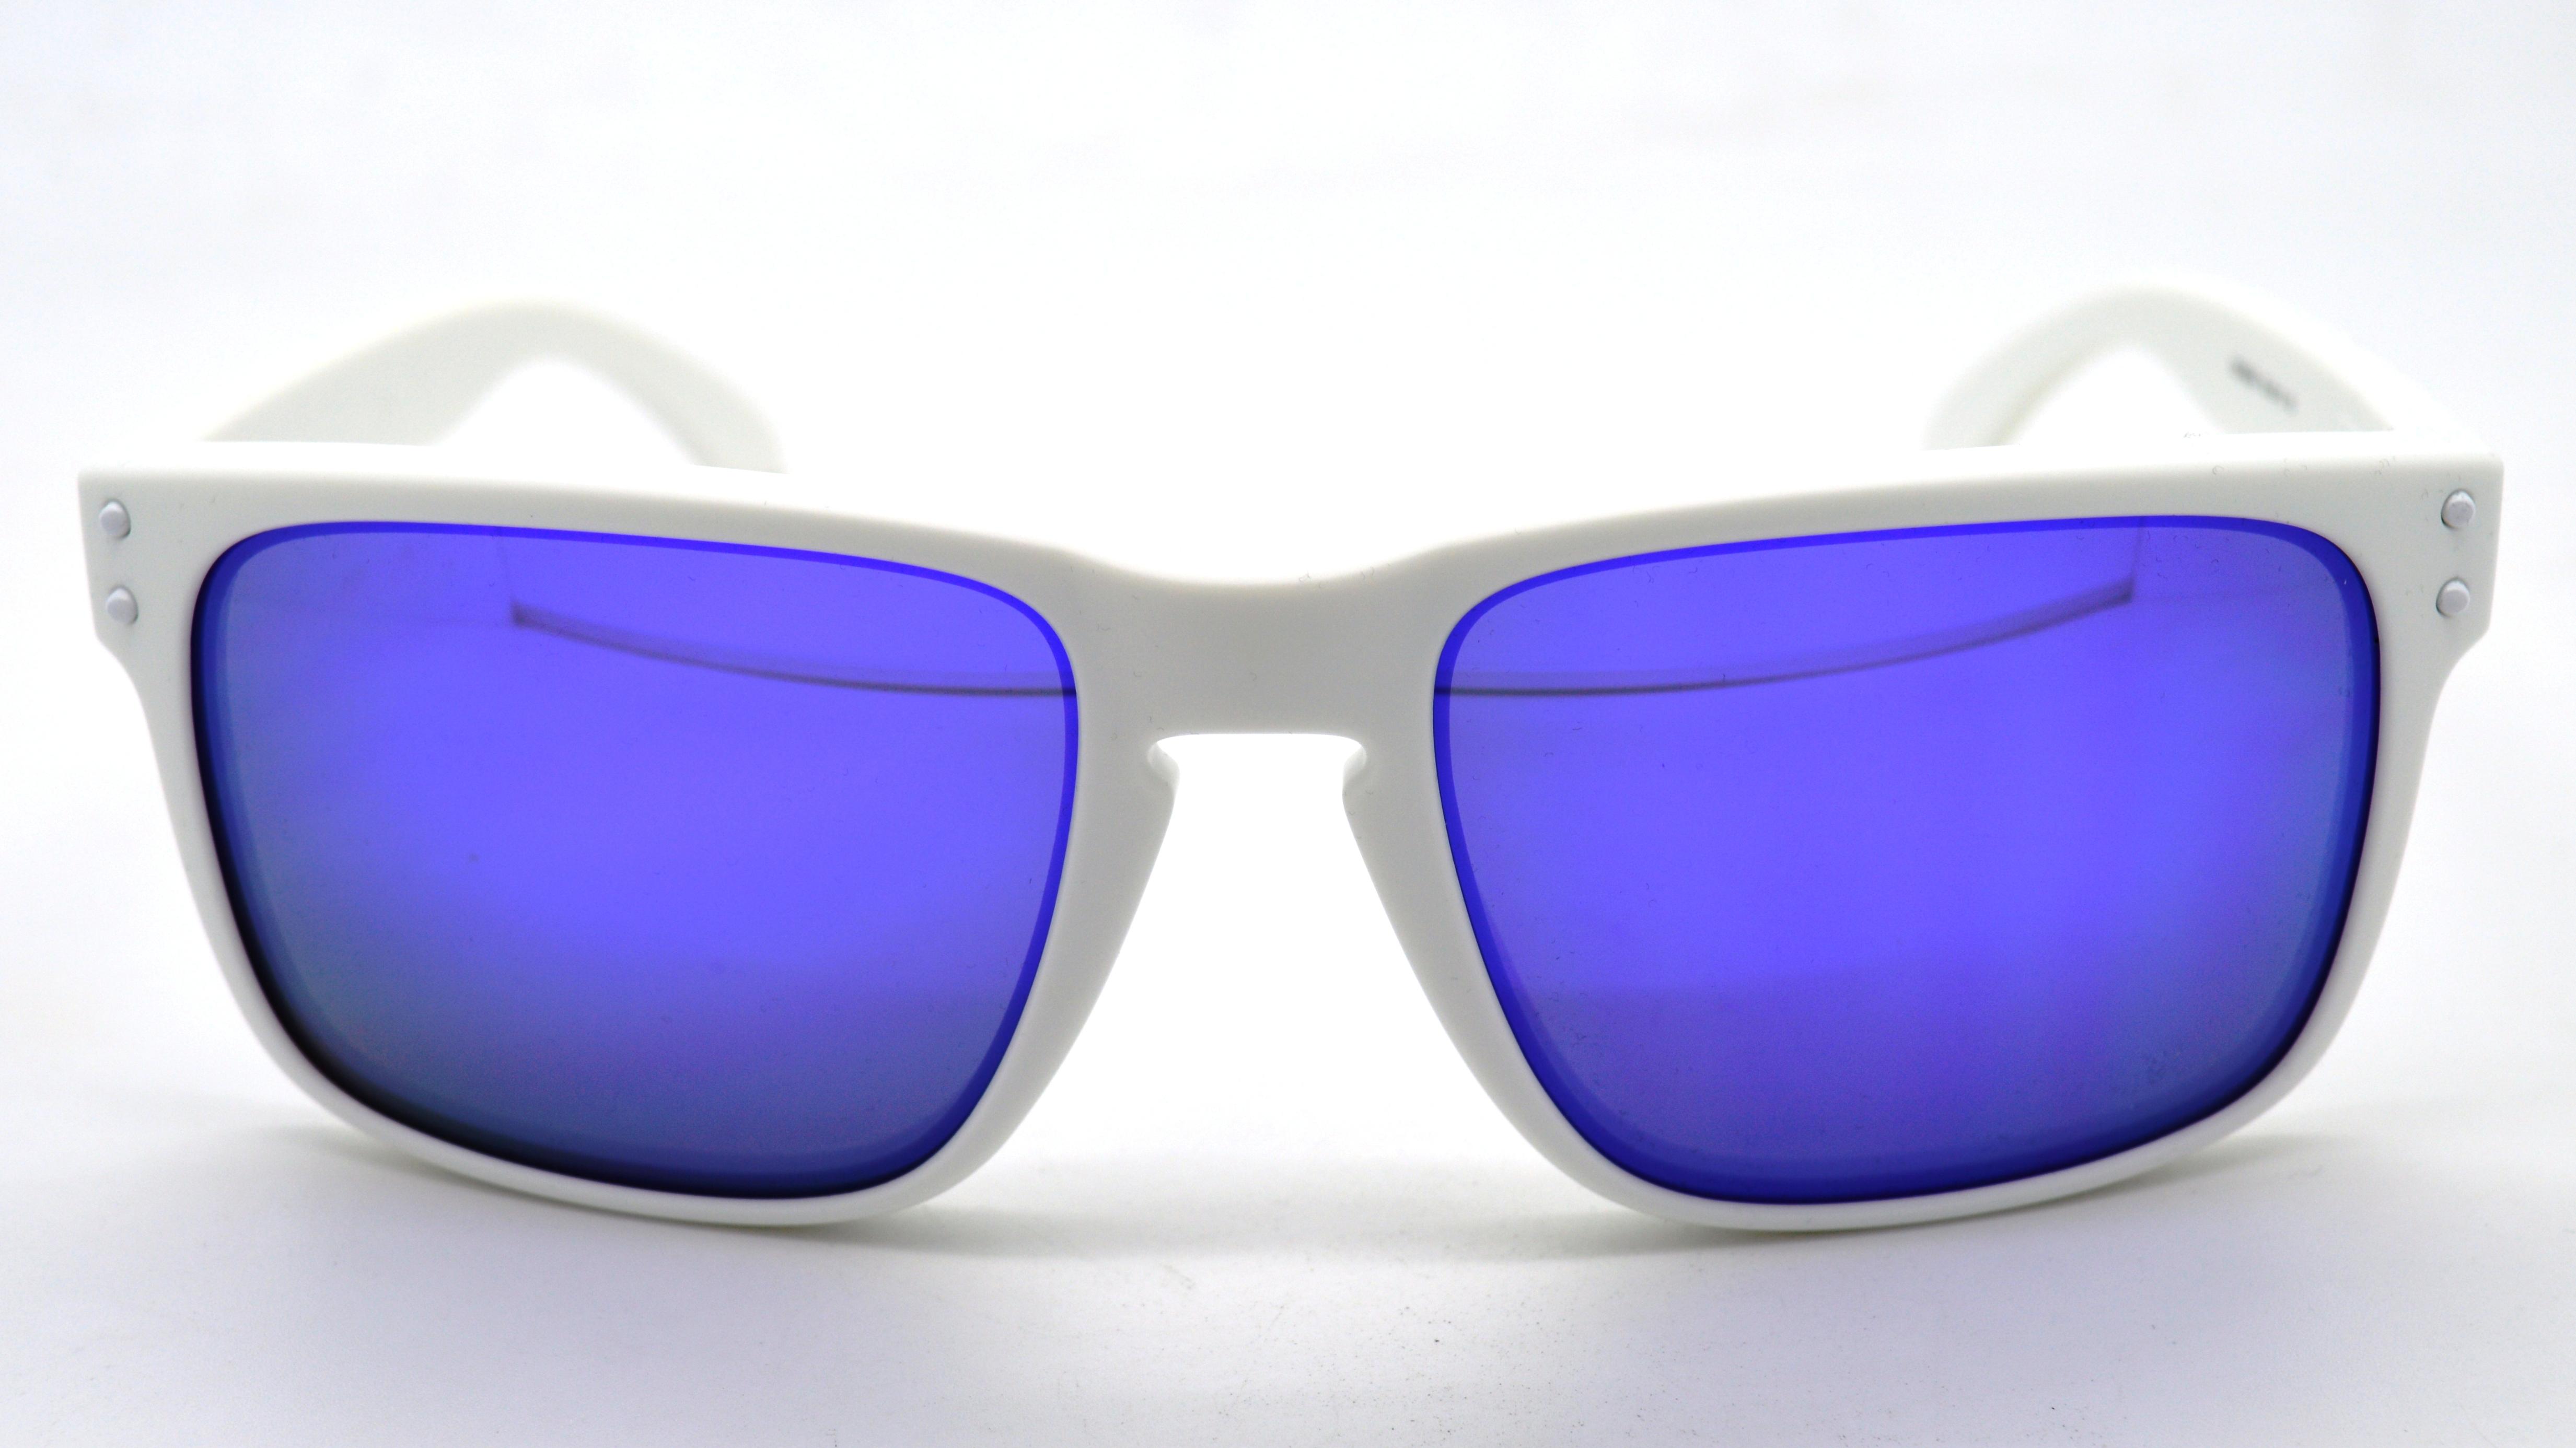 691357d6f9c Oakley Holbrook Matte White Violet Iridium « Heritage Malta